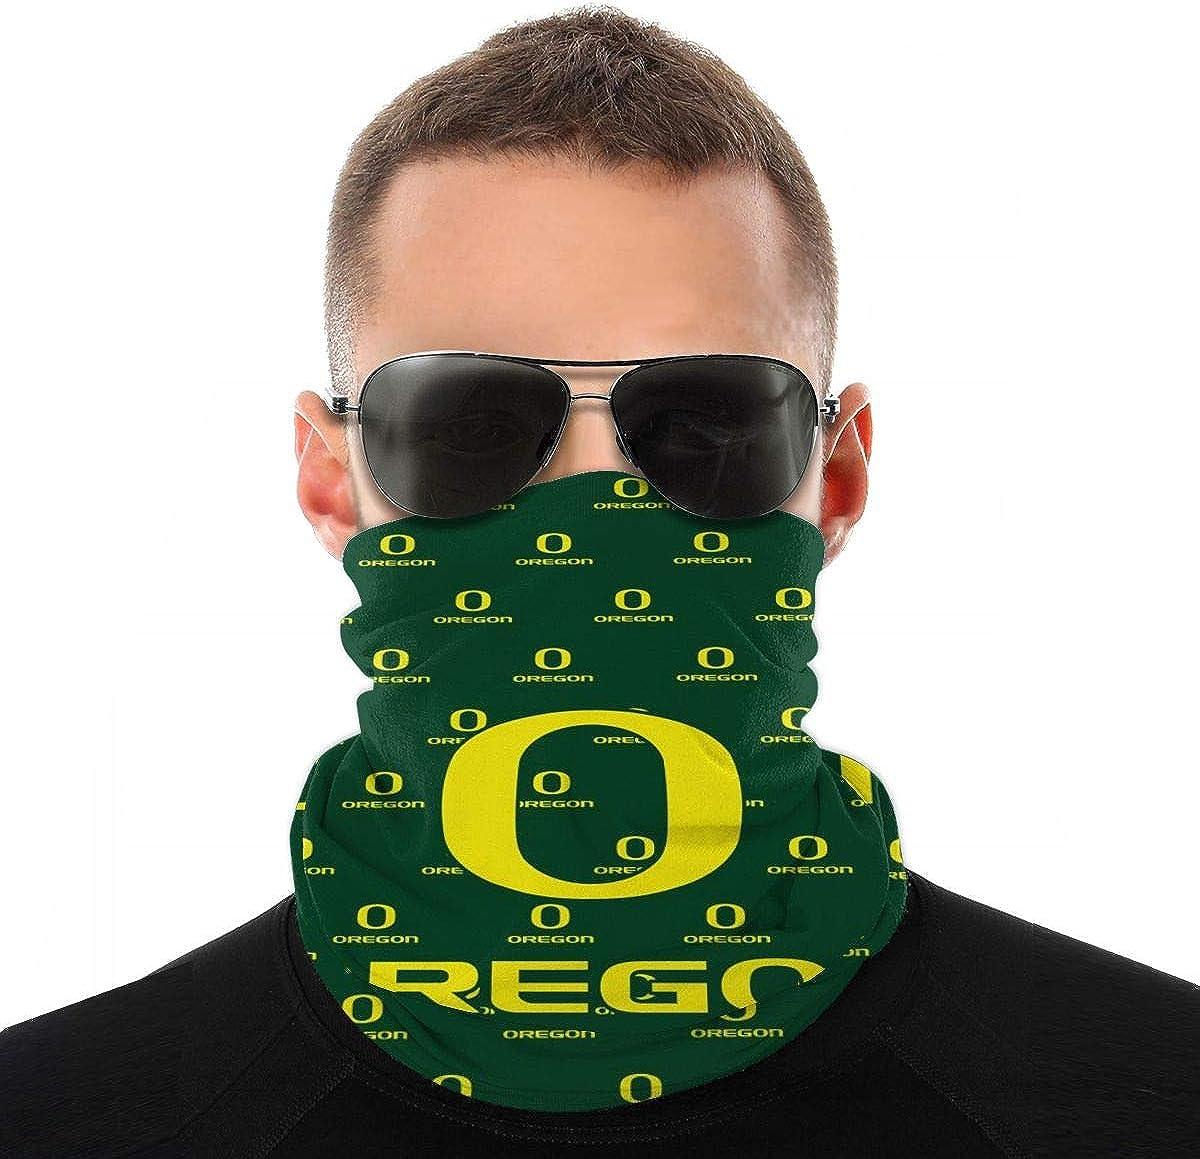 MADISON GRIFFITHS Bandana Face Mask American State Oregon Dustproof Windproof Variety Head Scarf Balaclava For Women Men